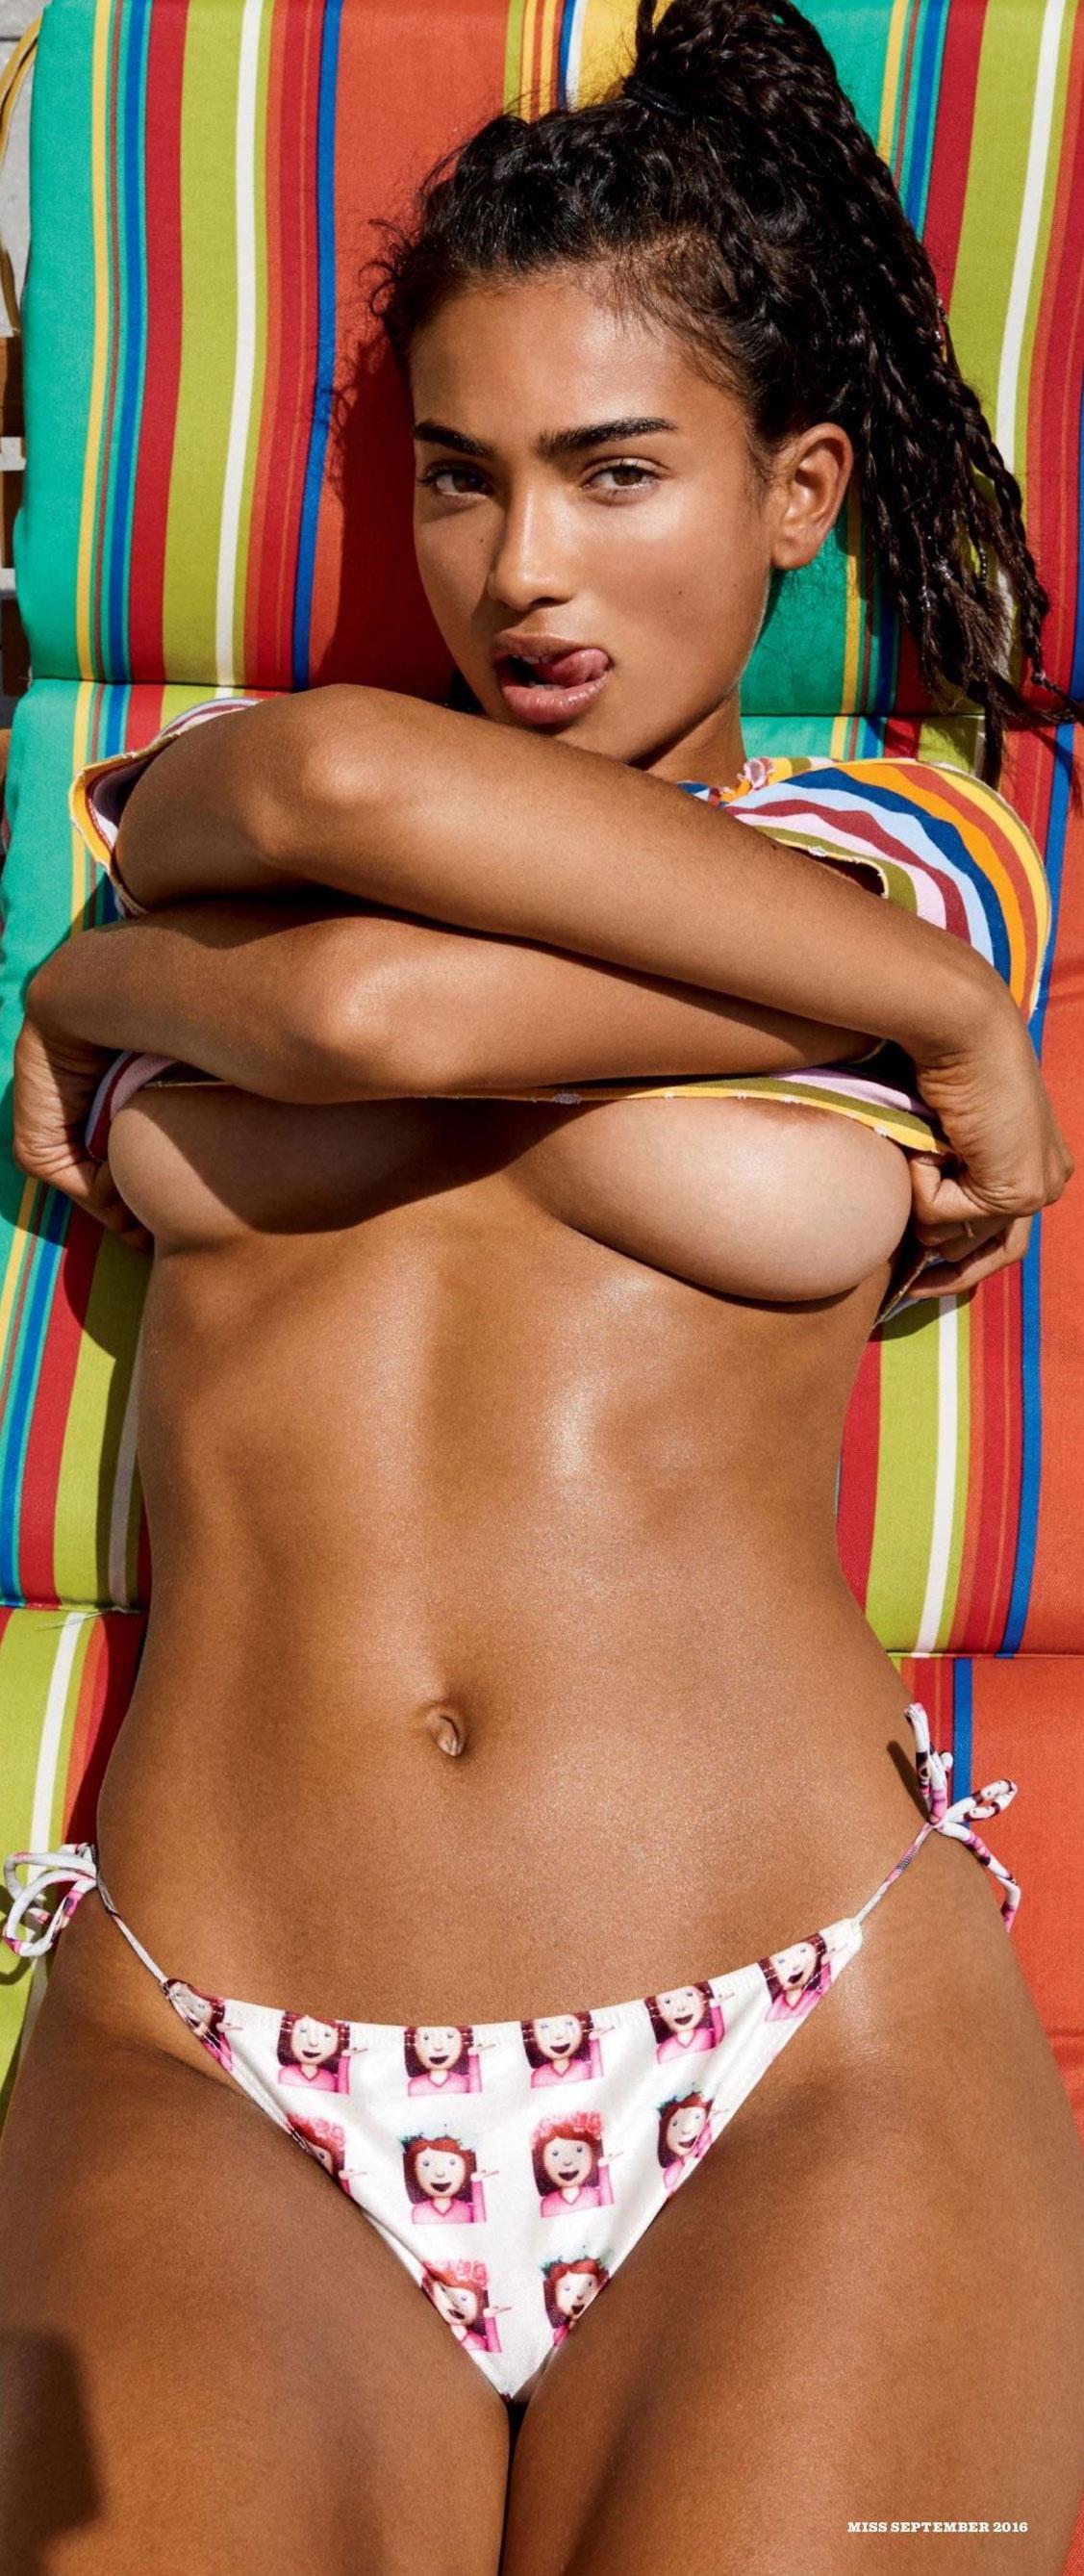 Девушка месяца Келли Гейл / Kelly Gale - Playboy USA september 2016 playmate / photo by Chris Heads